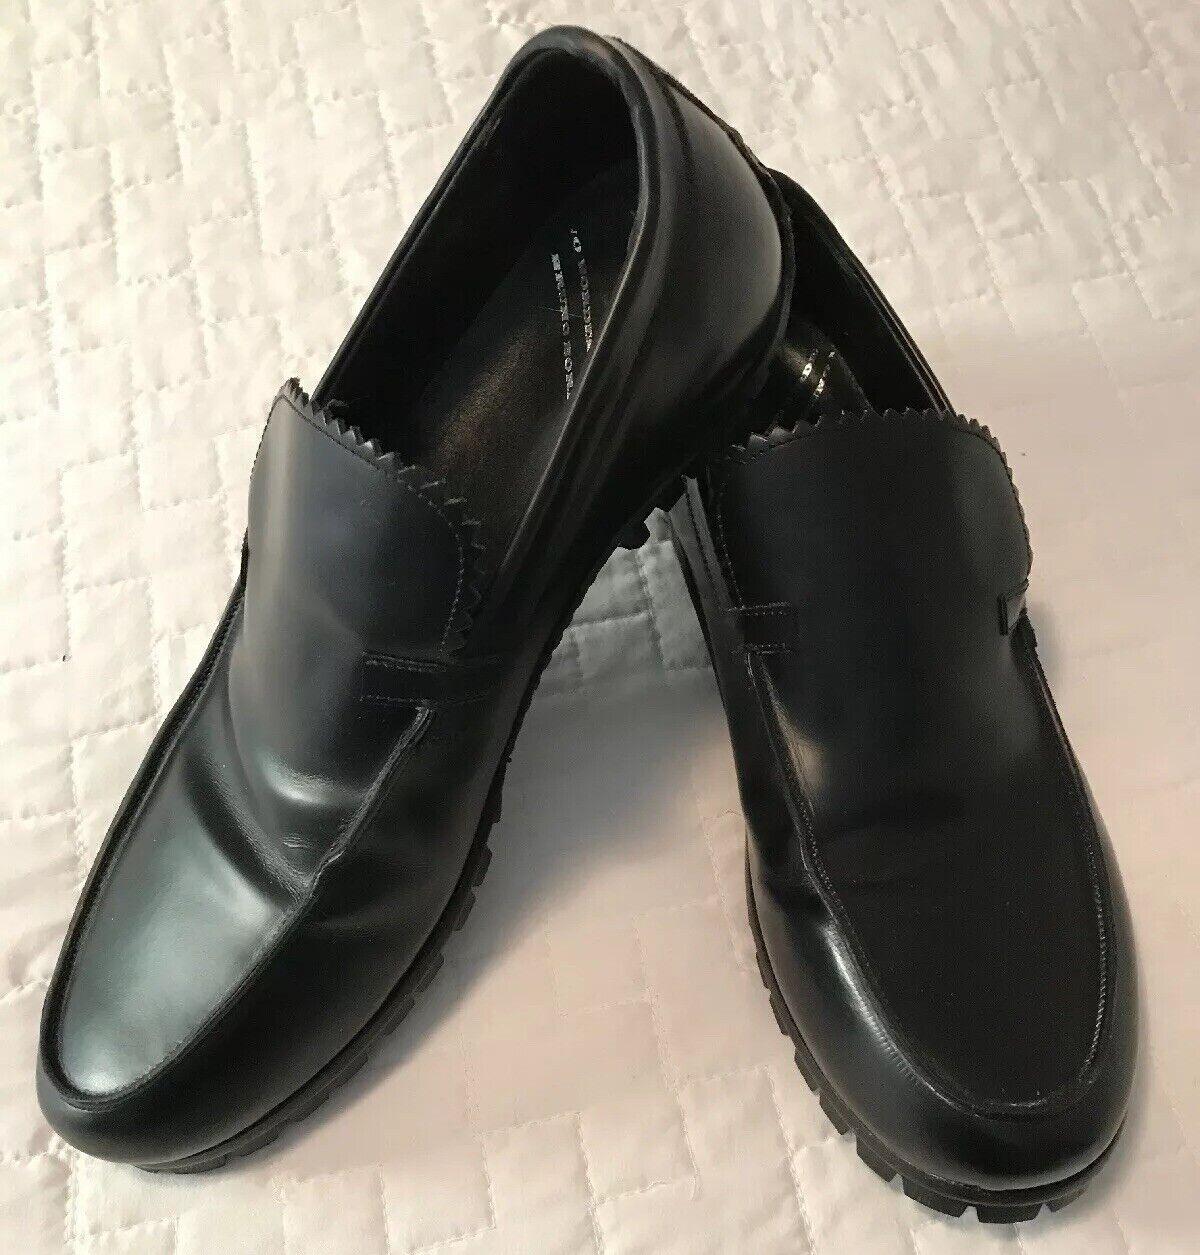 New Bruno Bordese Black Leather Driving Mocassin shoes Vibram Sole Mens 9 Medium